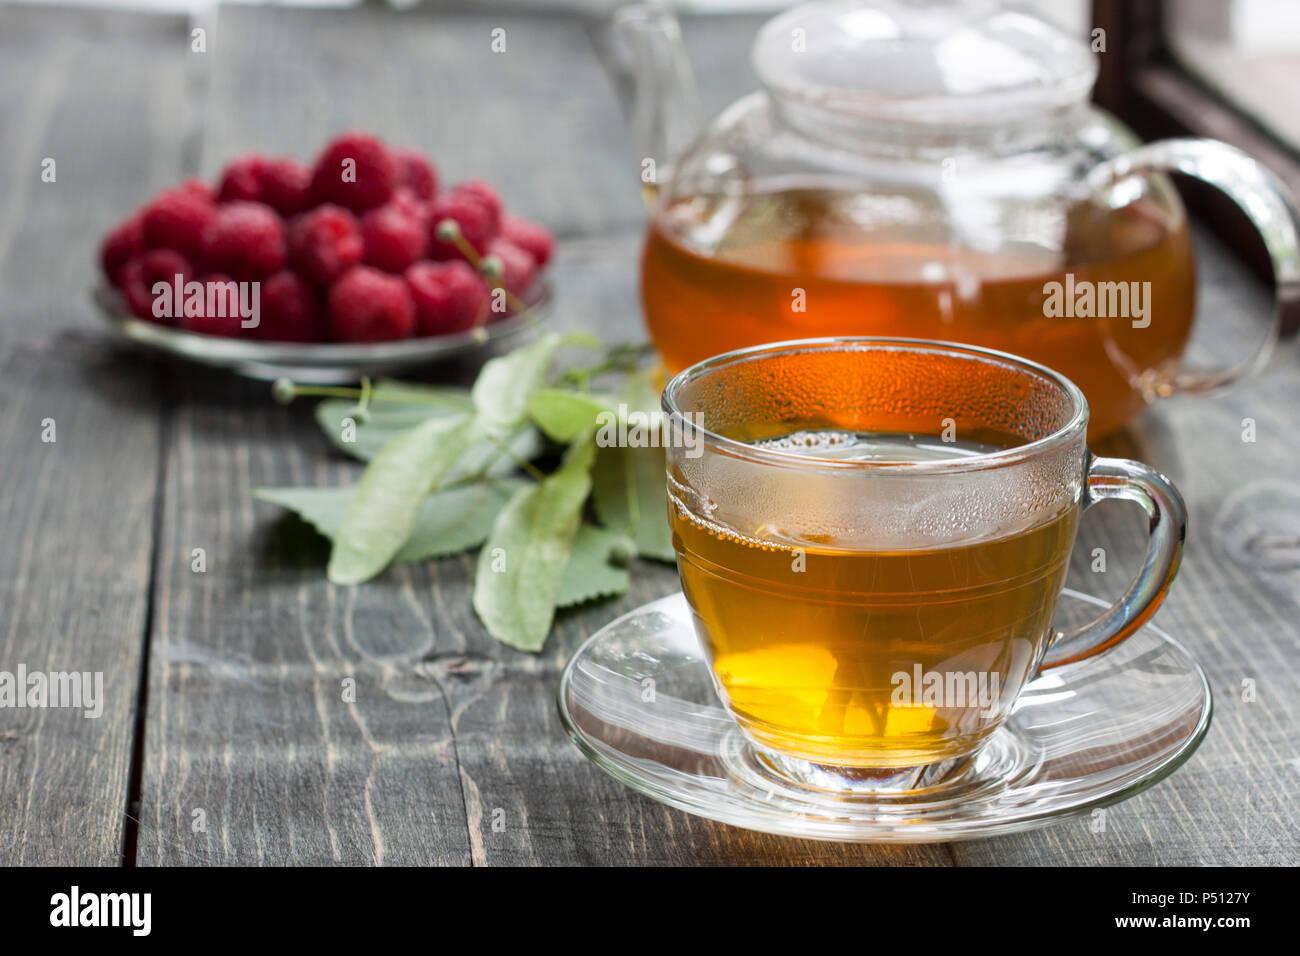 Frambuesa y té verde de un tilo en una mesa de madera Foto de stock